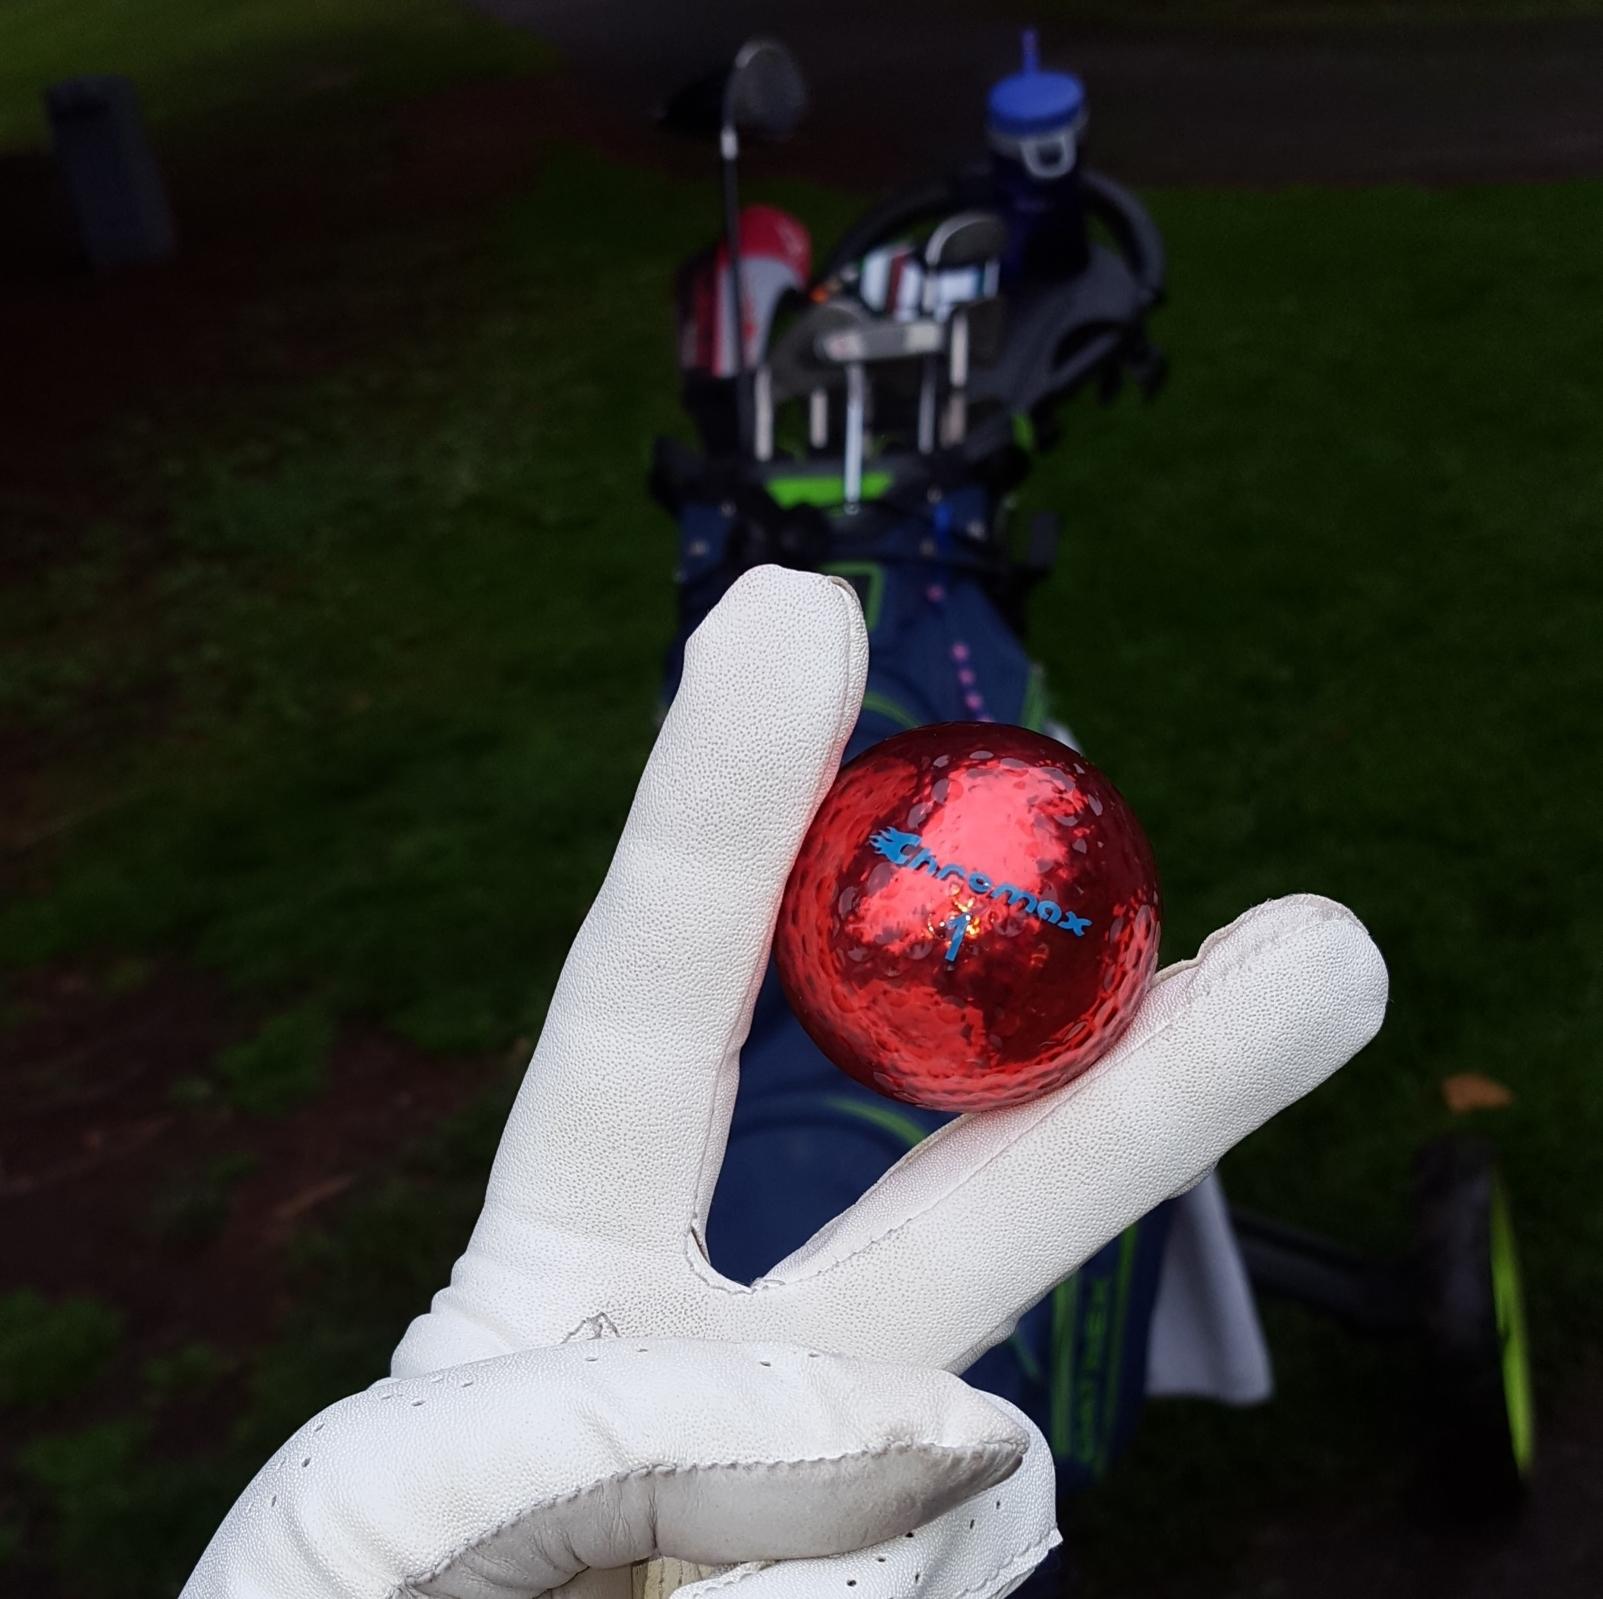 Chromax red golf balls M1x Special Edition